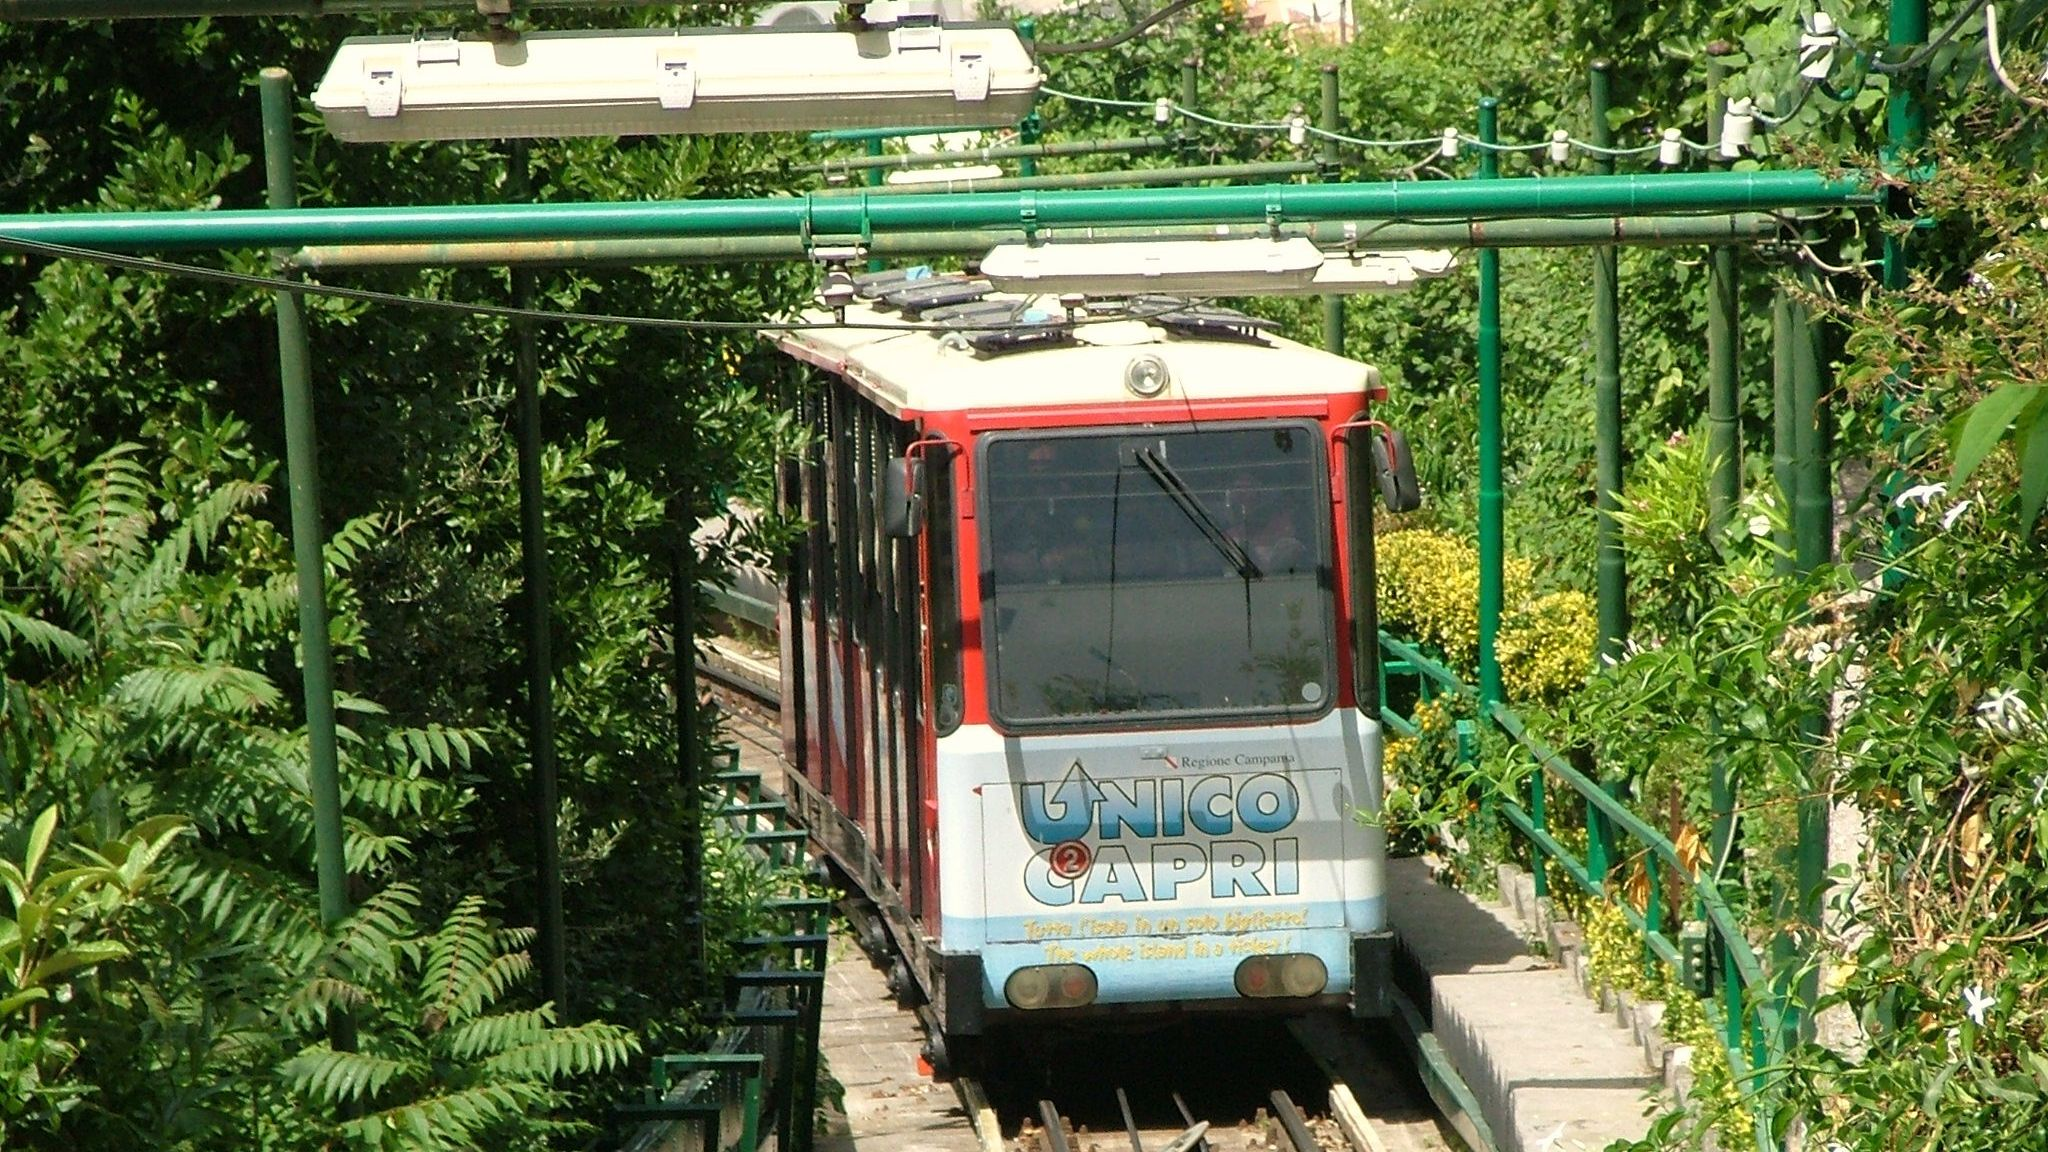 Capri beach trolley passing through forest area.